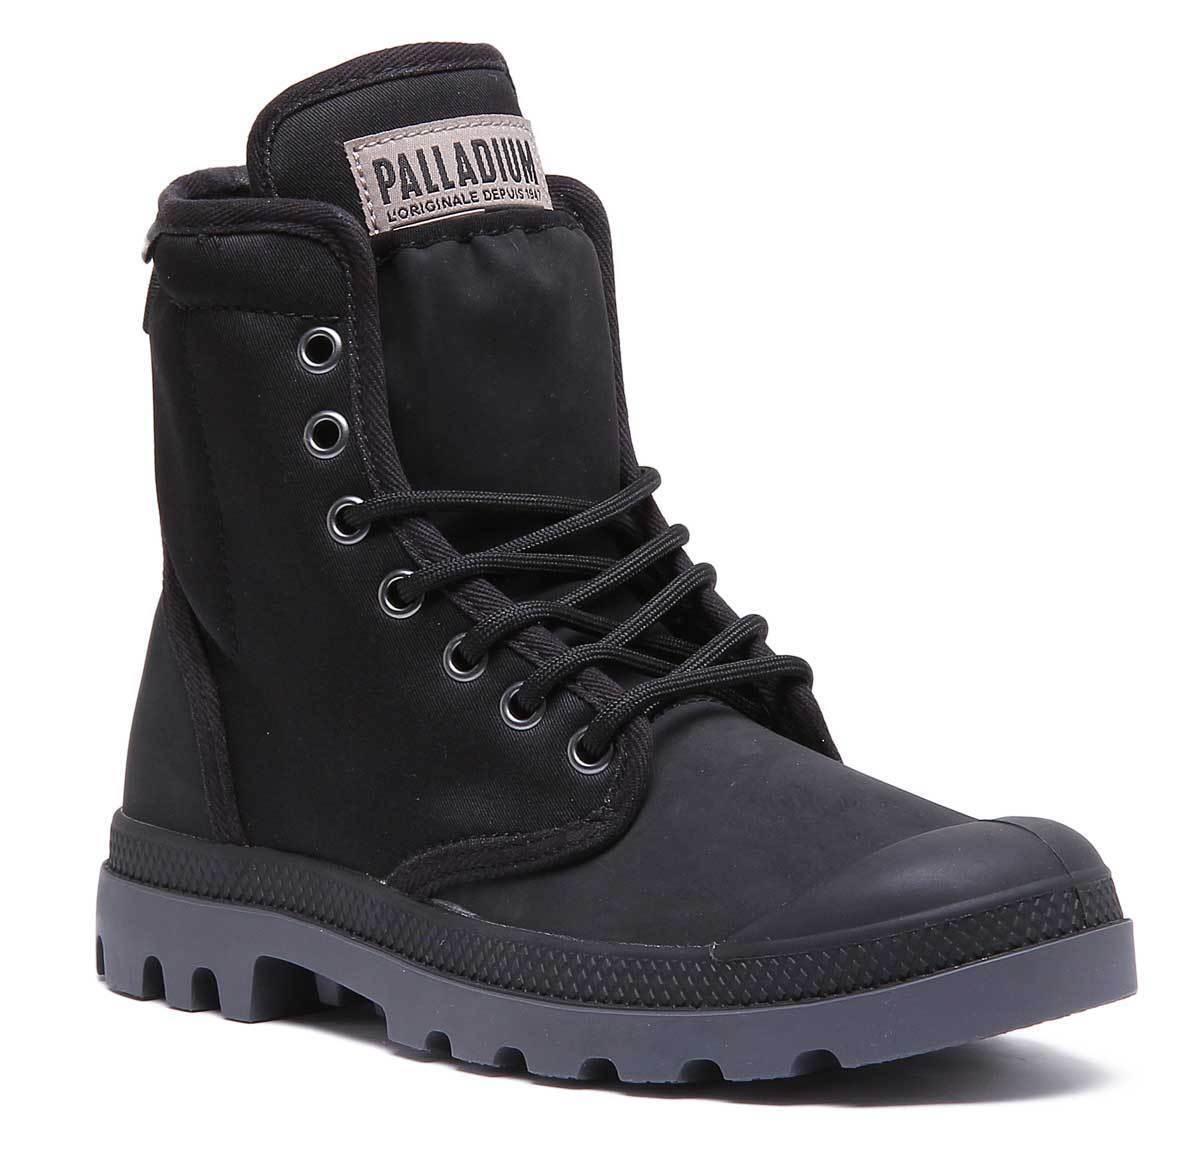 Palladium Pampa Solid Ranger Womens Synthetic Black Hiking Boots UK Size 3 - 8